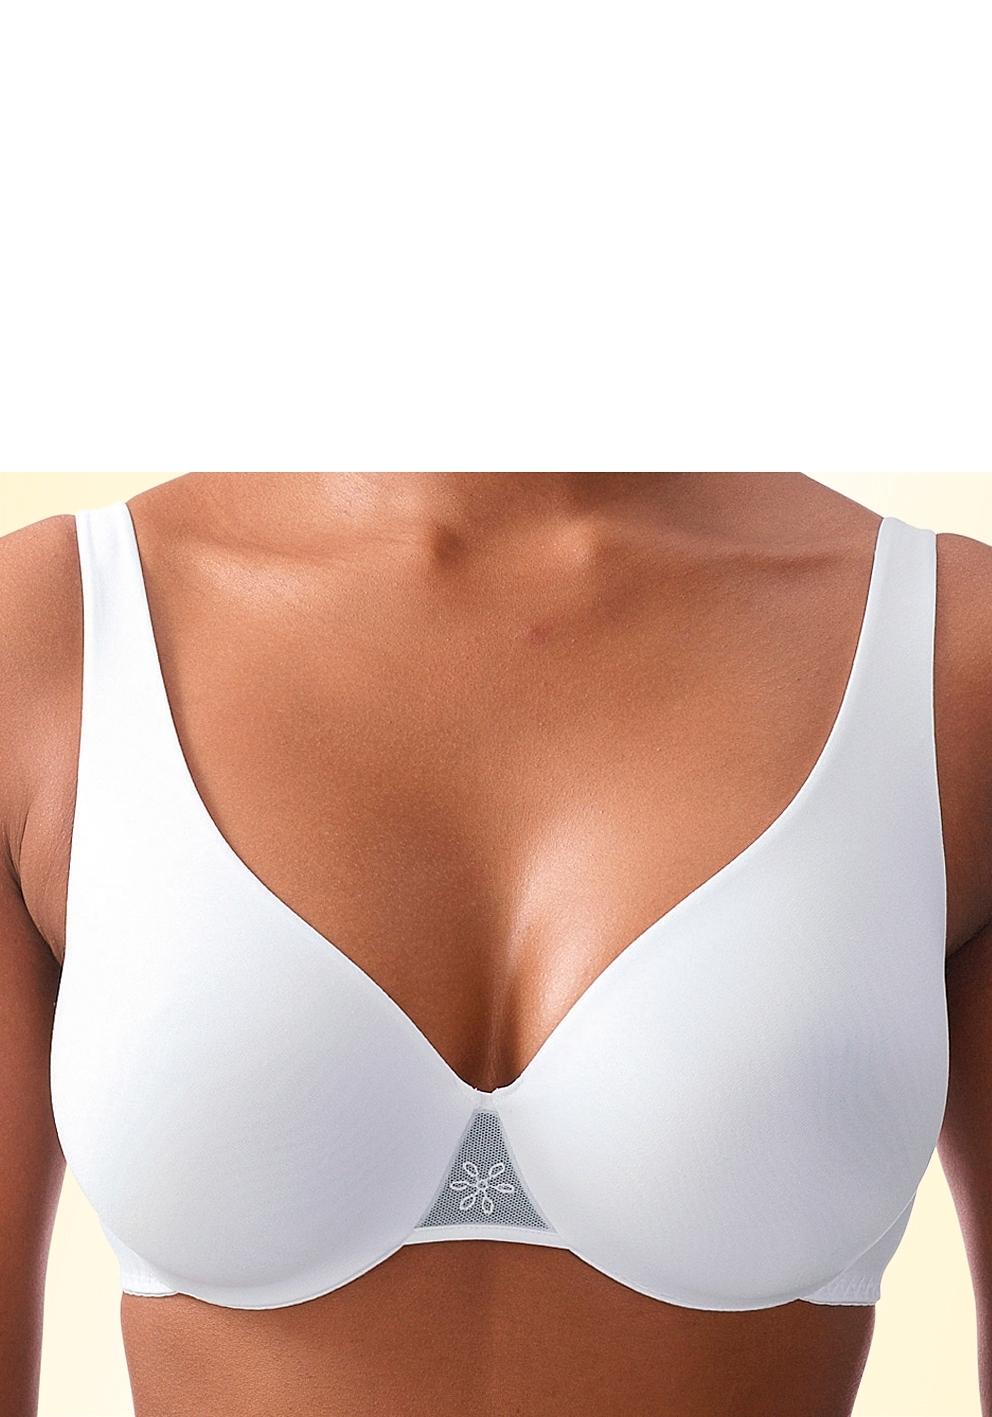 Van 2Nuance Shop T shirt Online bhSet N8OnwX0Pk